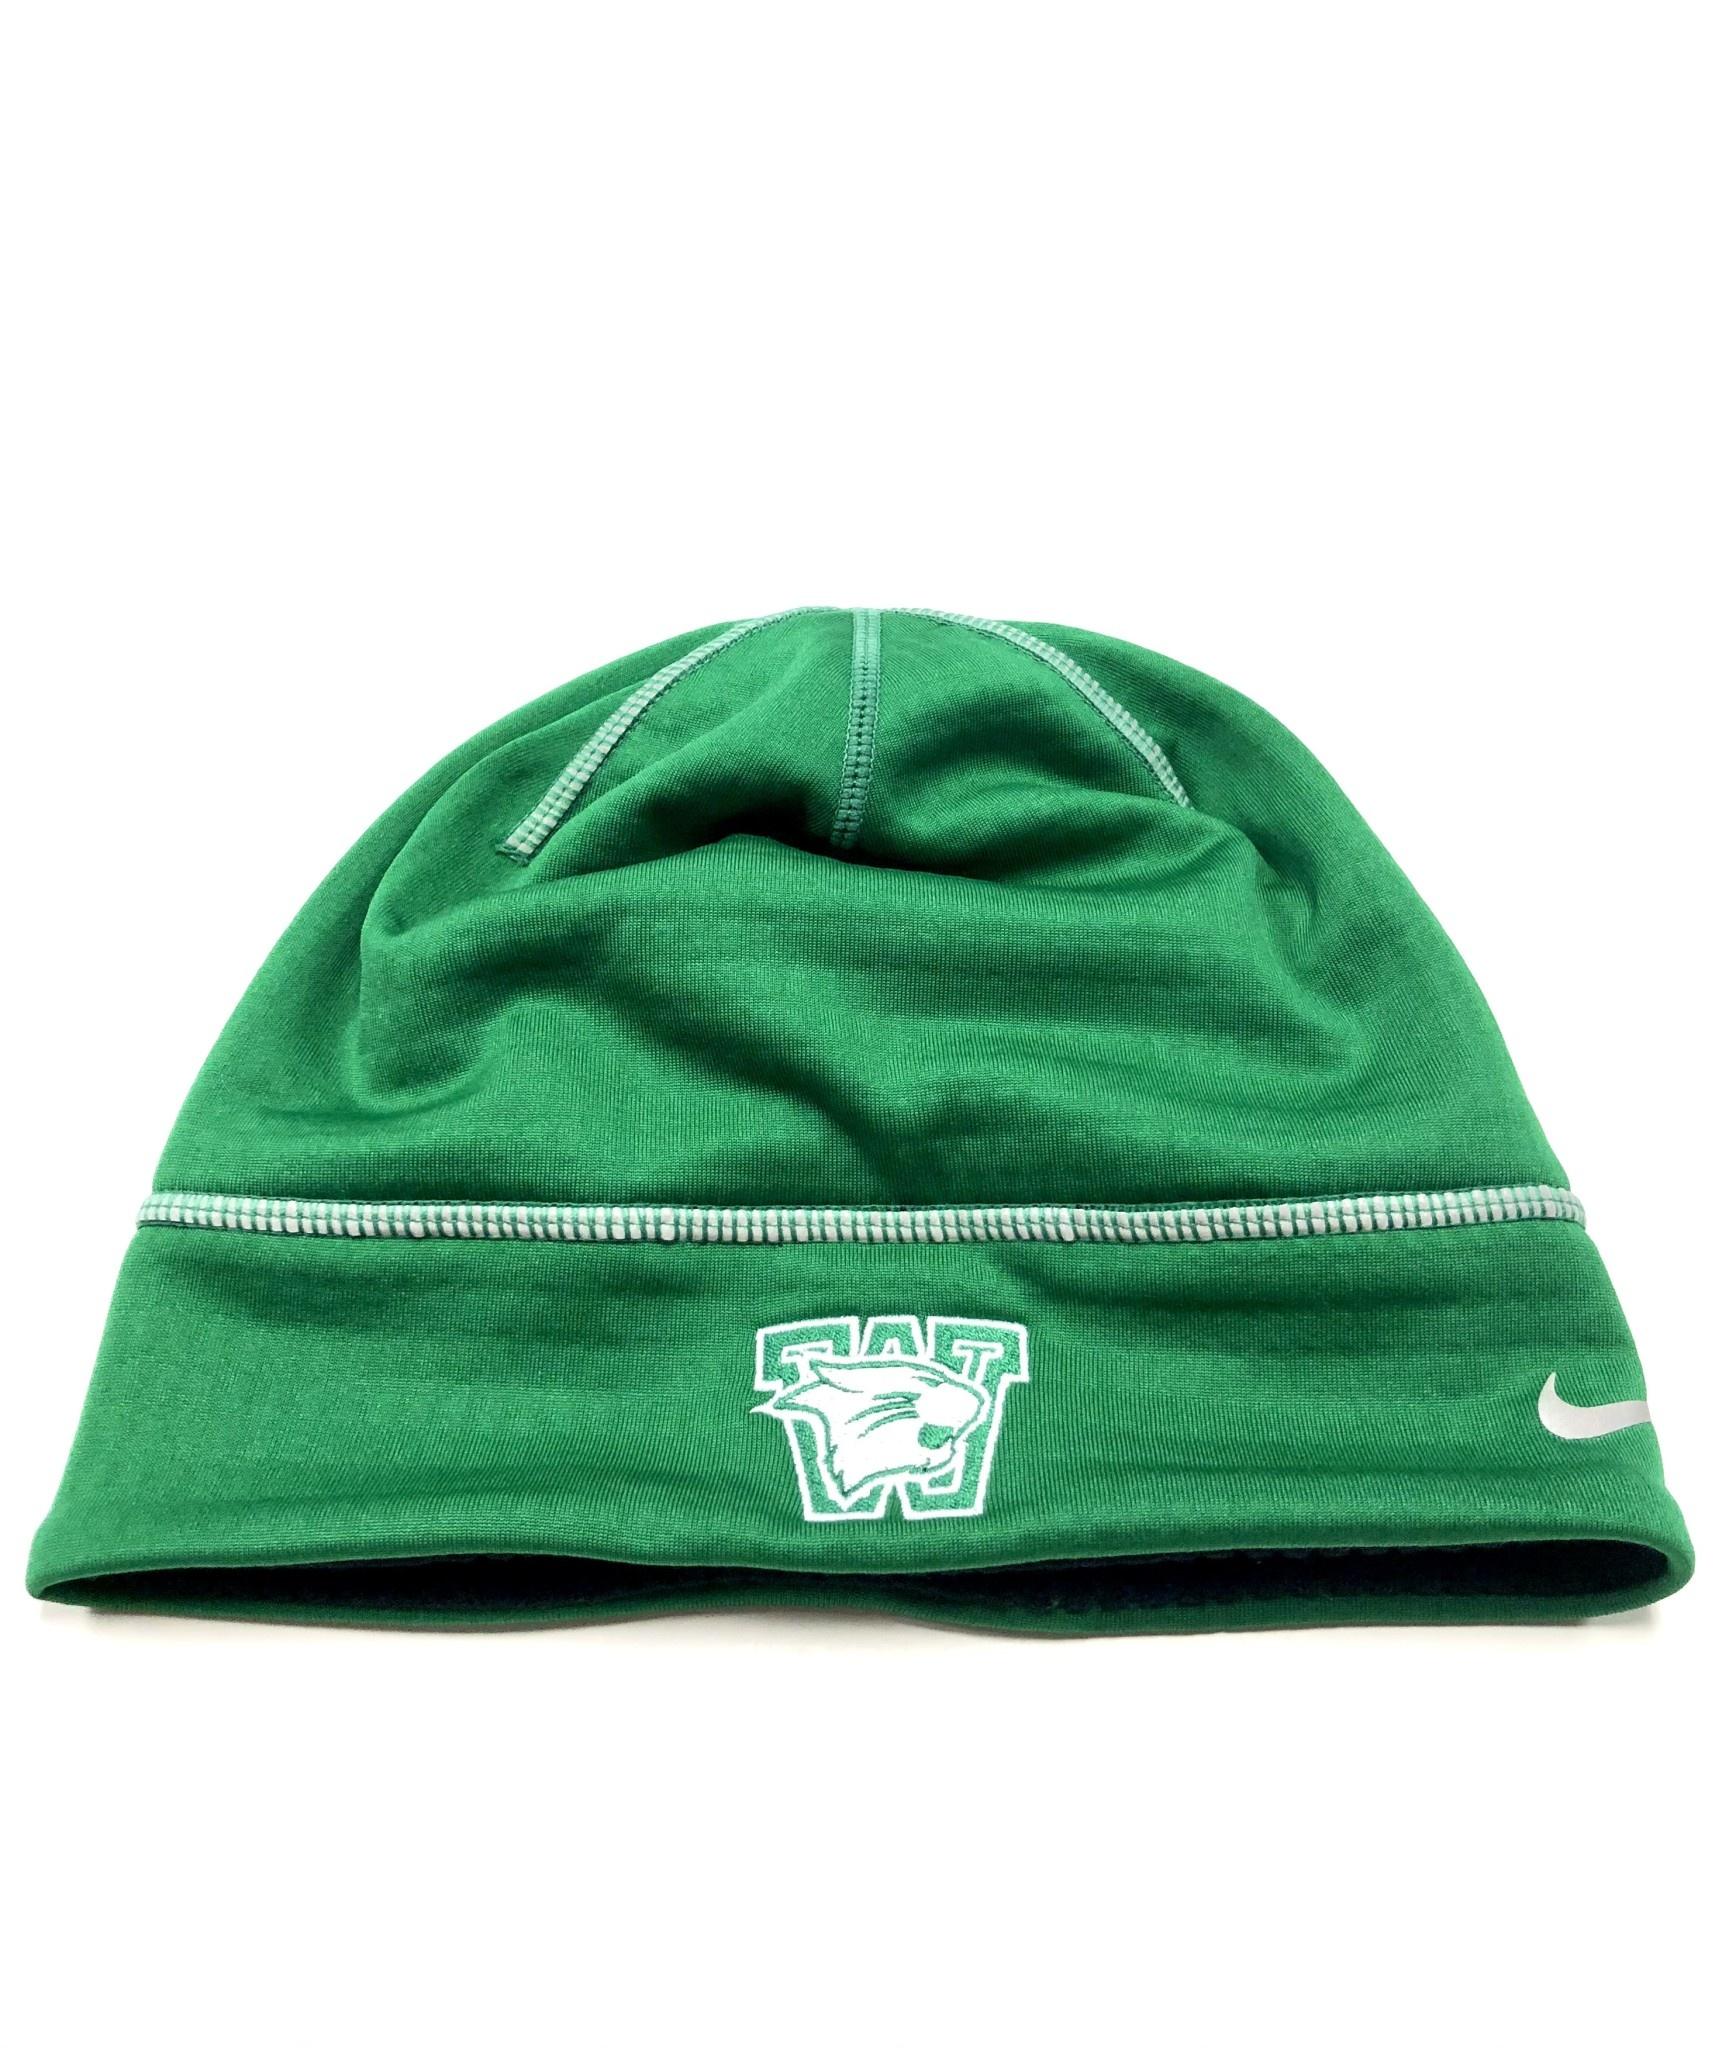 Nike Hat: Nike Championship Beanie w/Fleece Lining